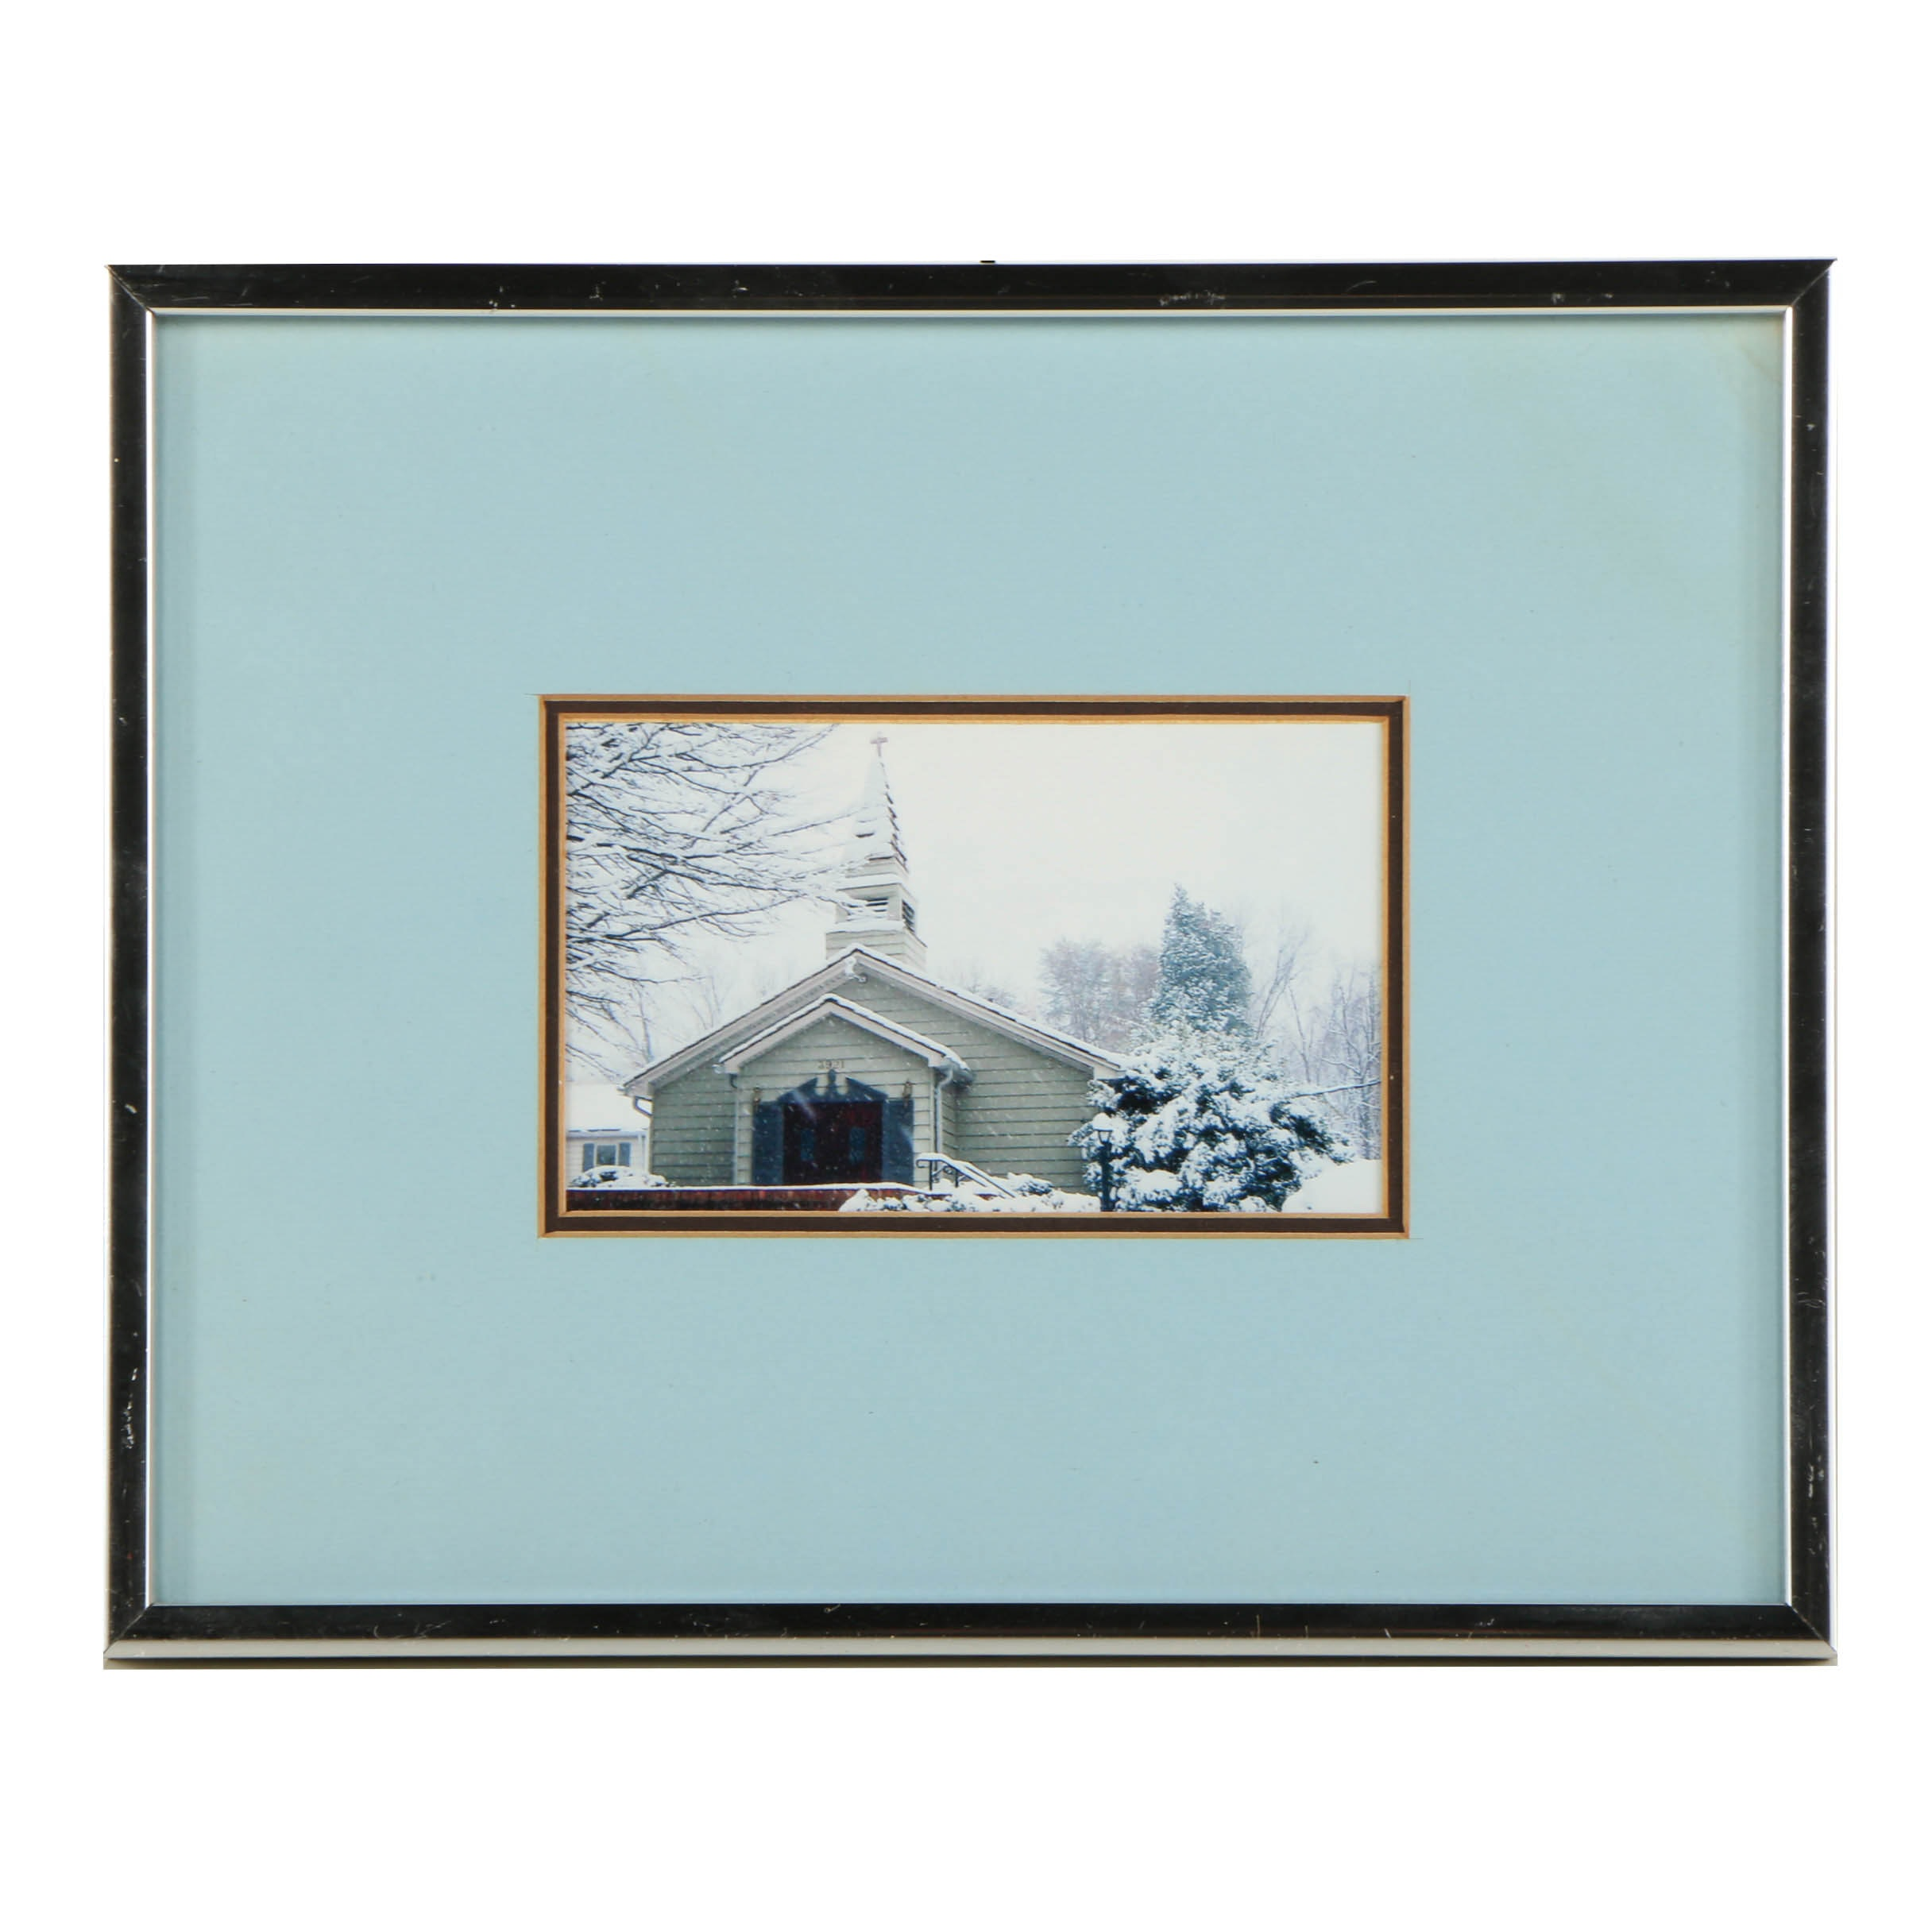 Digital Color Photograph of a Church